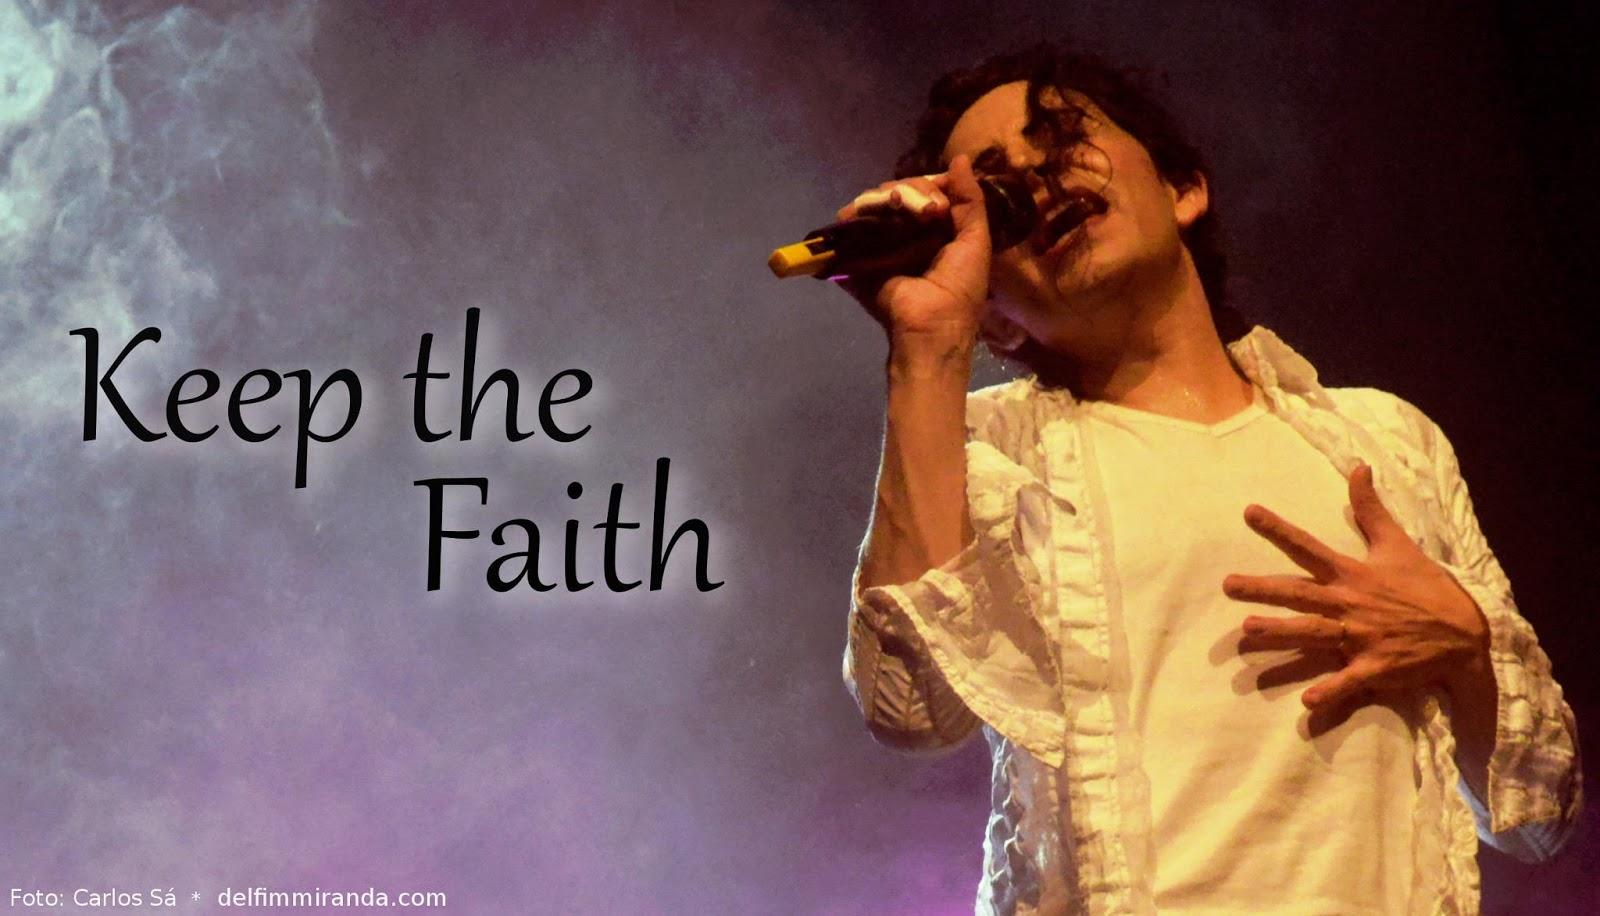 Delfim Miranda - Michael Jackson Tribute - Keep the Faith